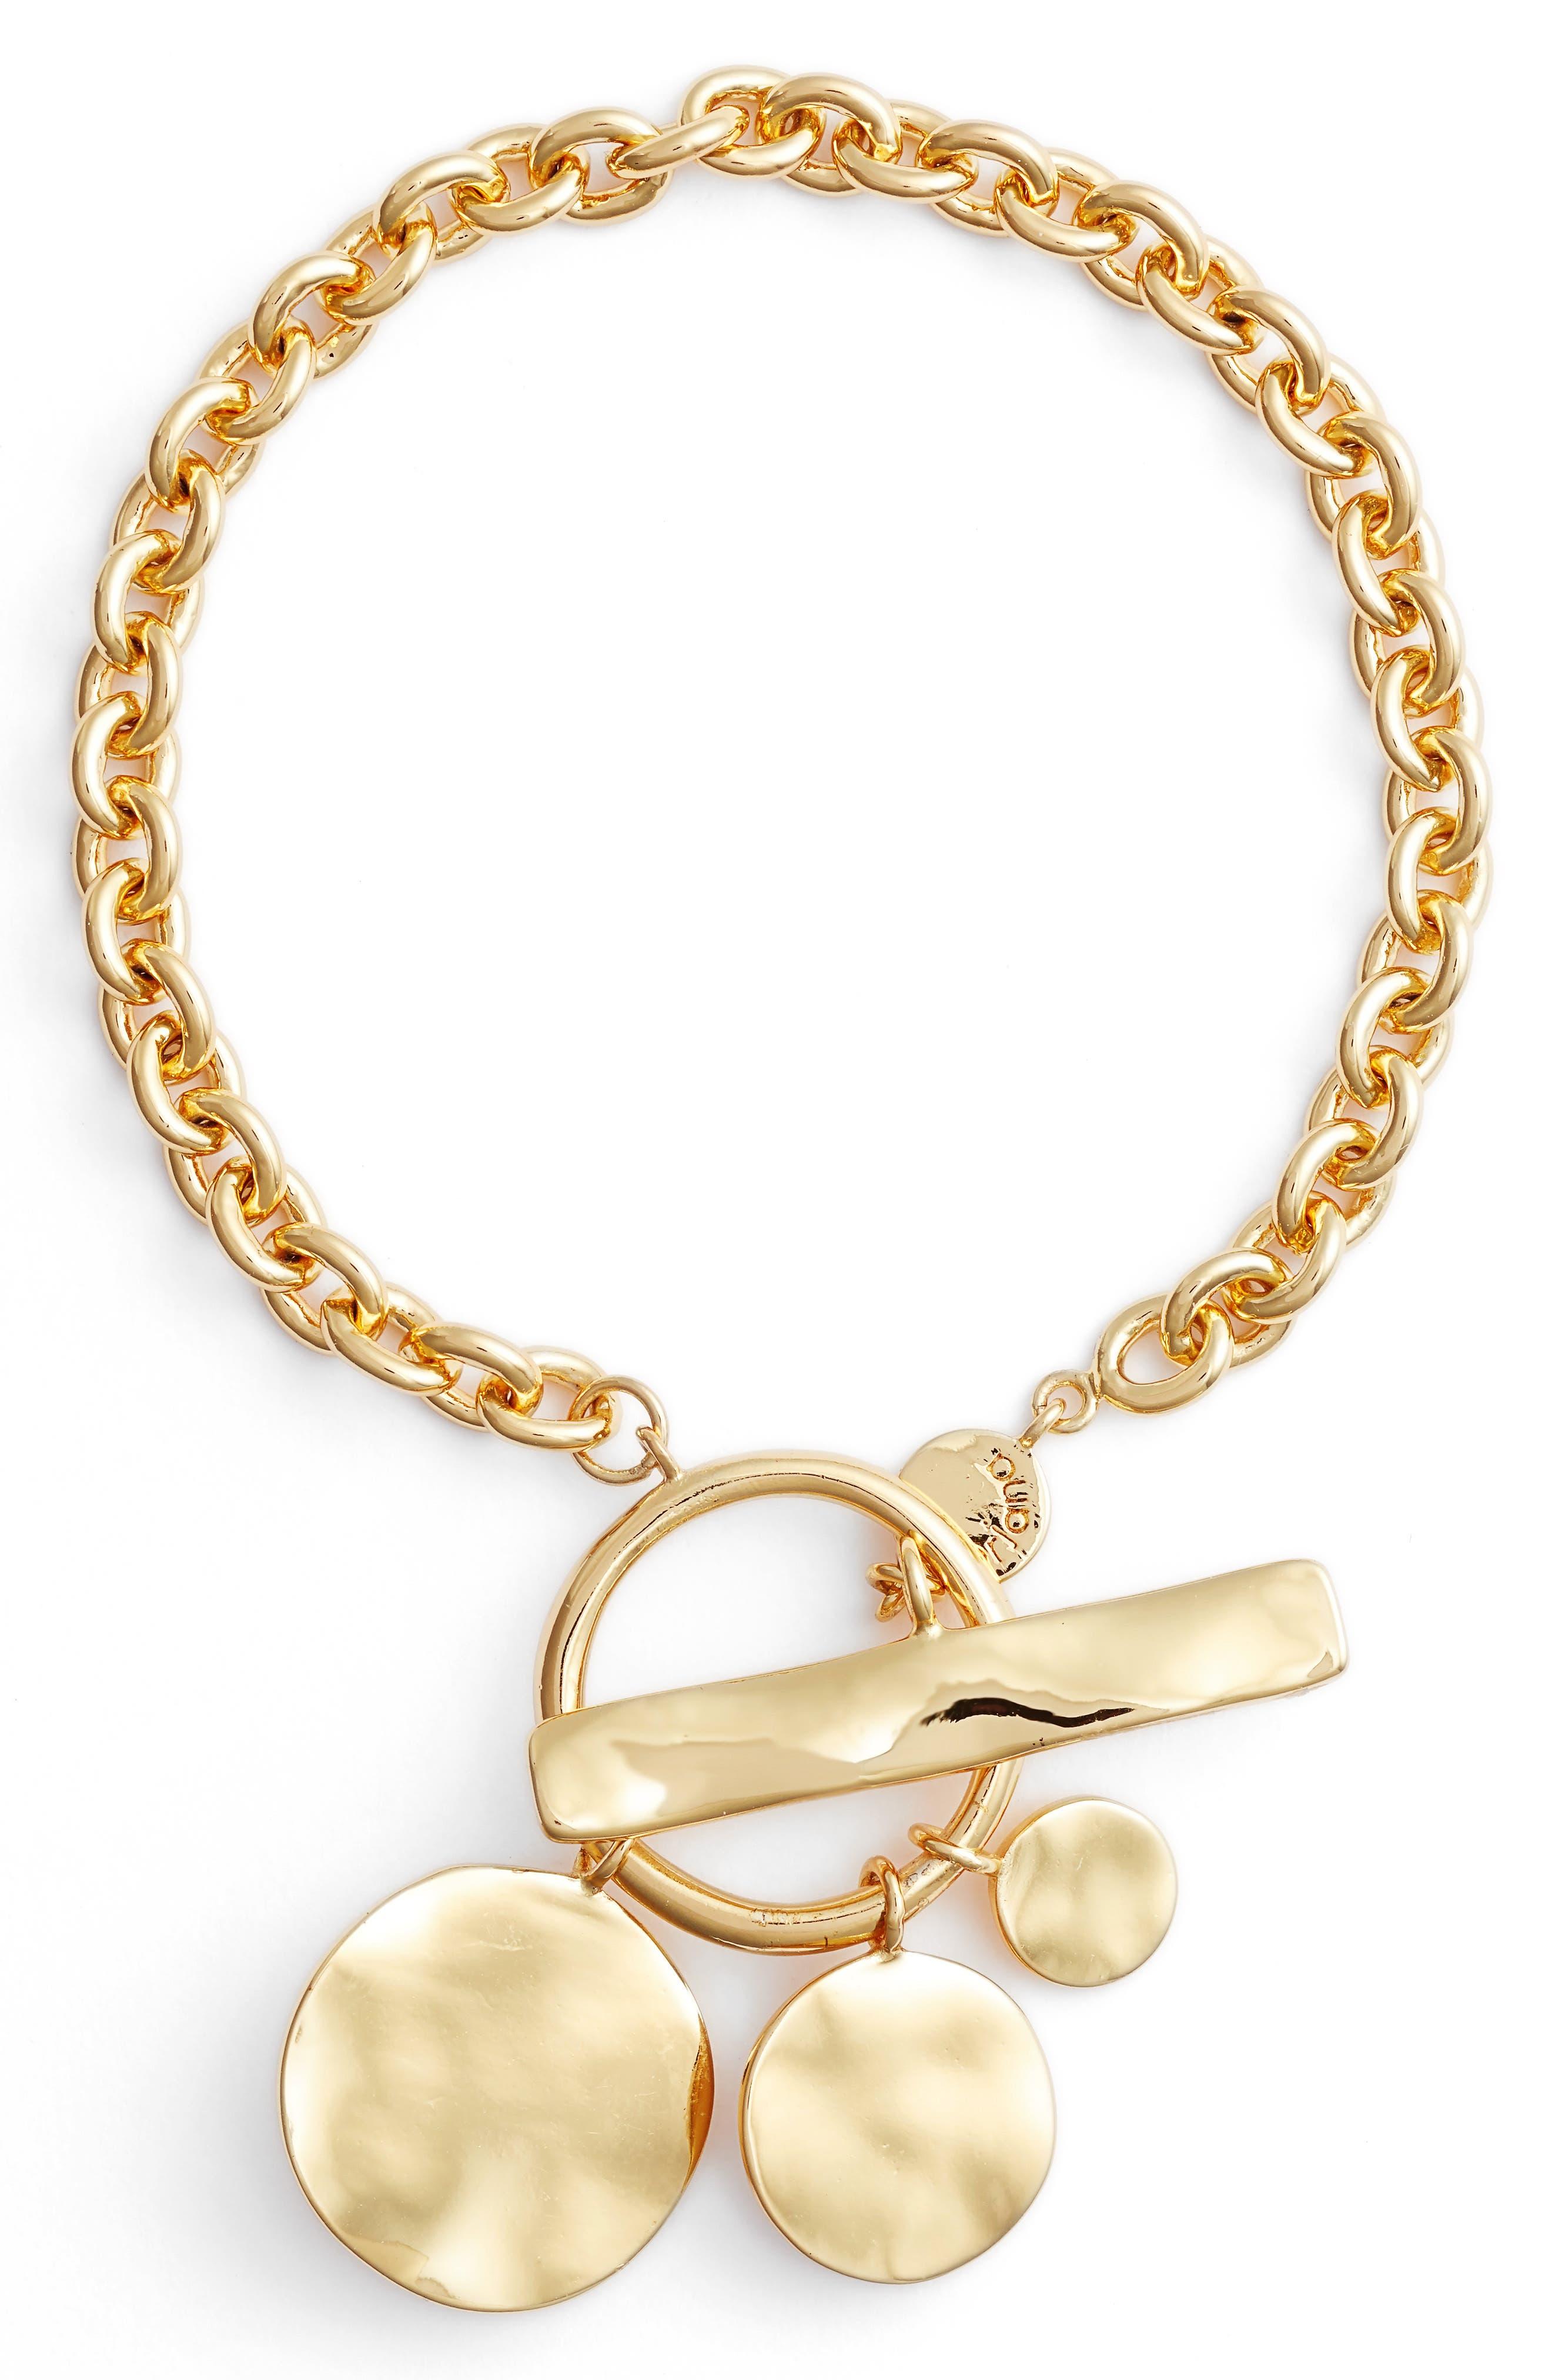 gorjana Chloe Hammered Disc Toggle Bracelet